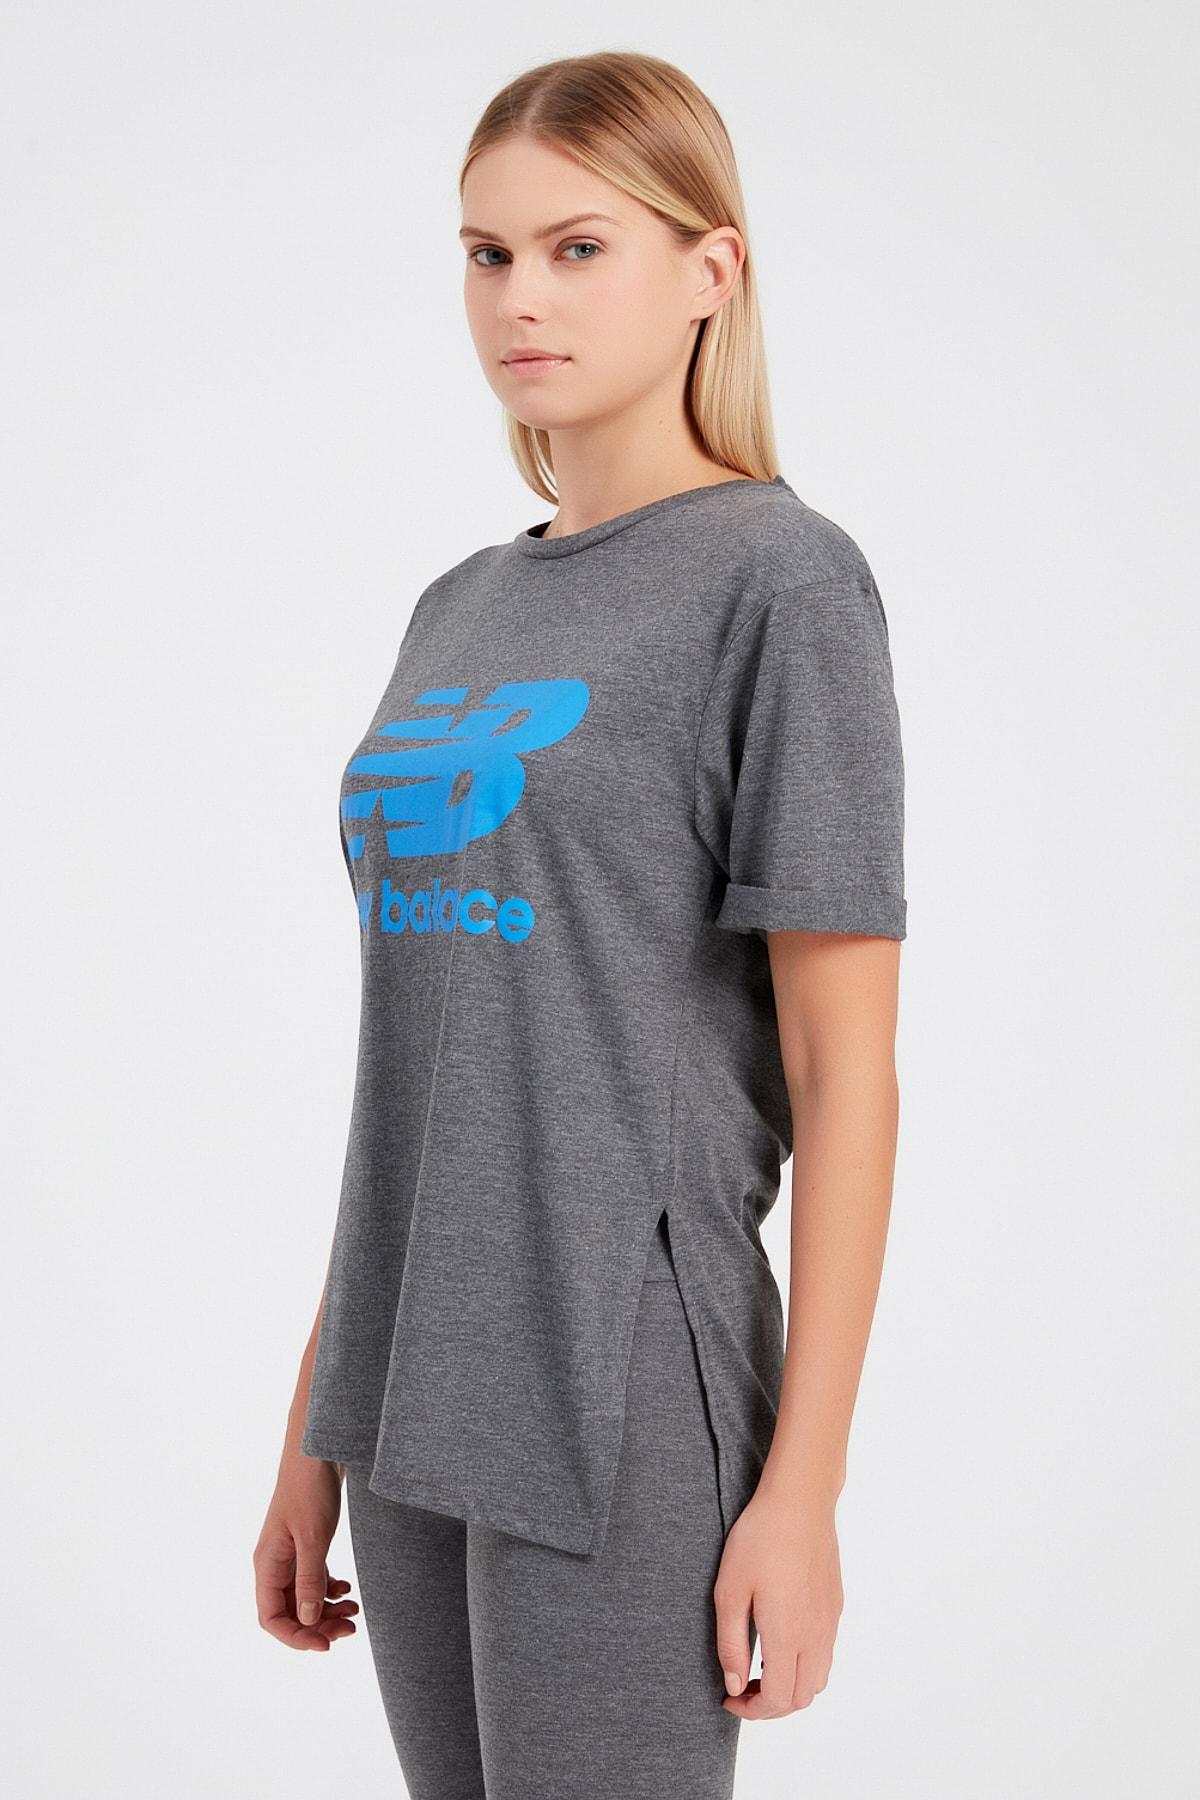 New Balance Spor T-Shirt - NB VOM TEE - V-WTT916-ANT 2